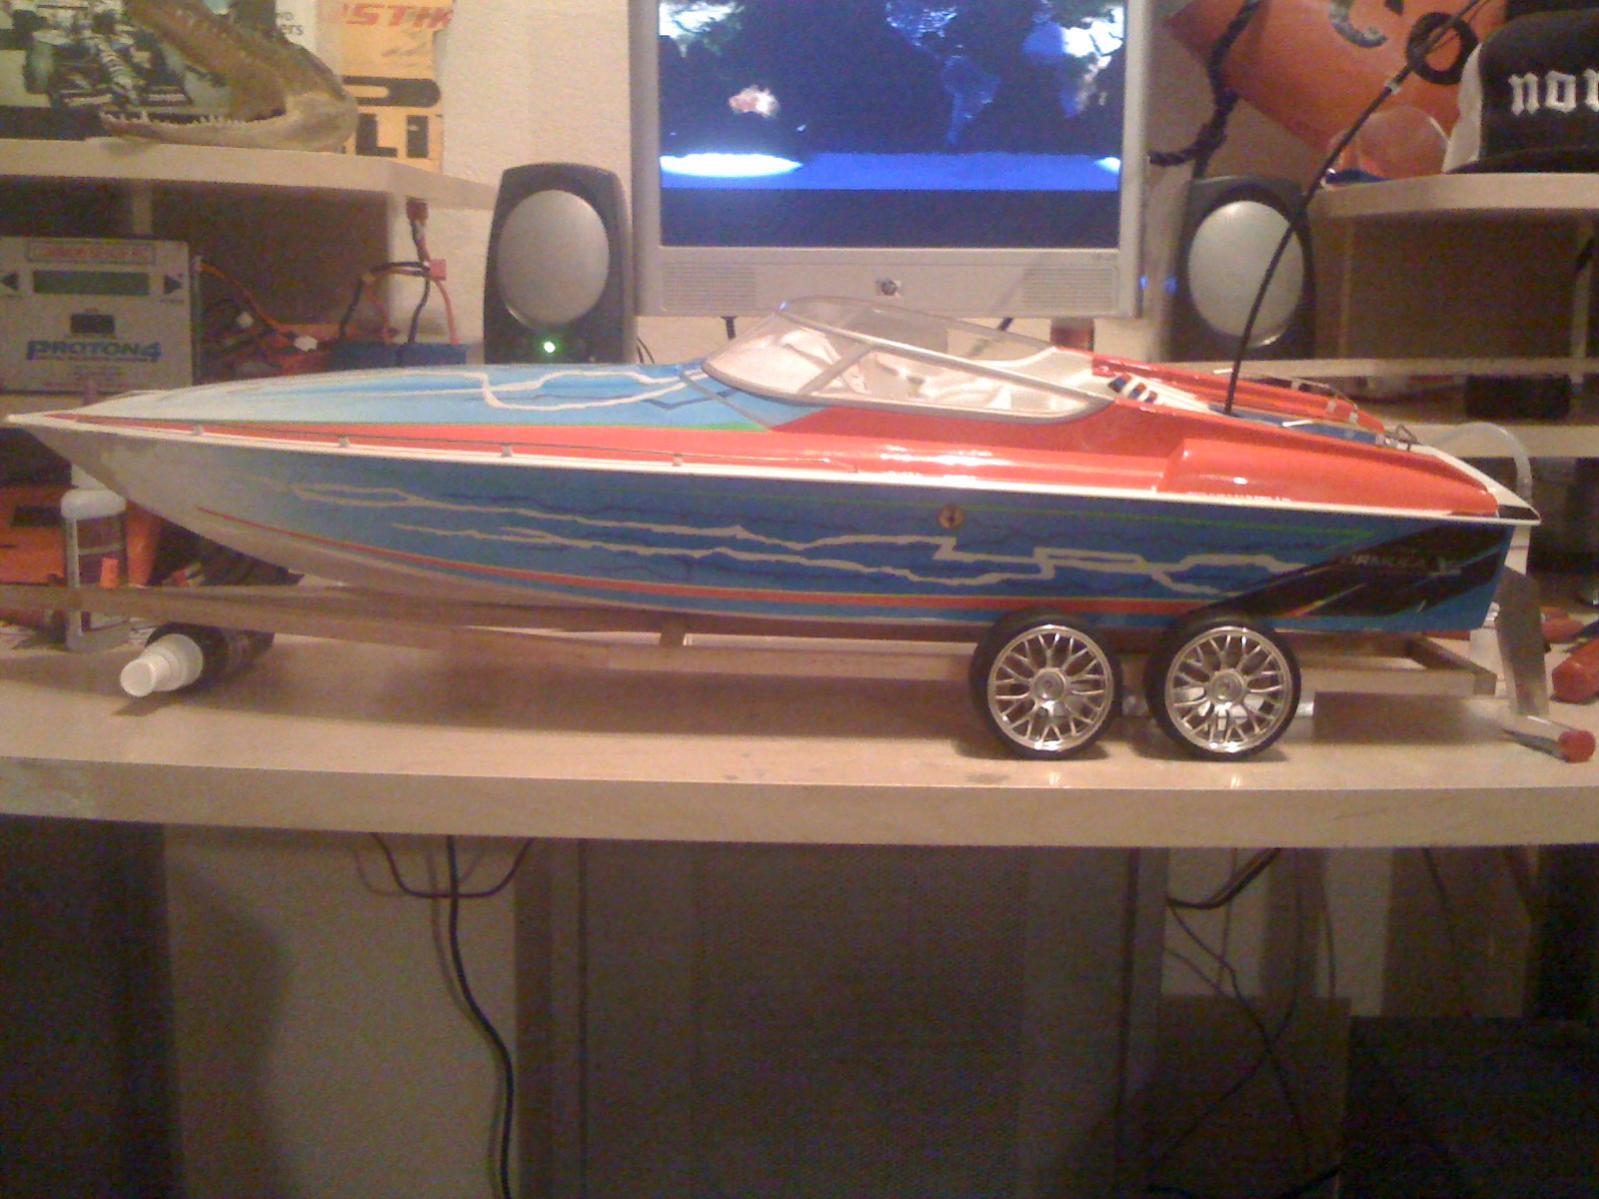 img_0274.jpg RC boat trailer build.-img_0275.jpg